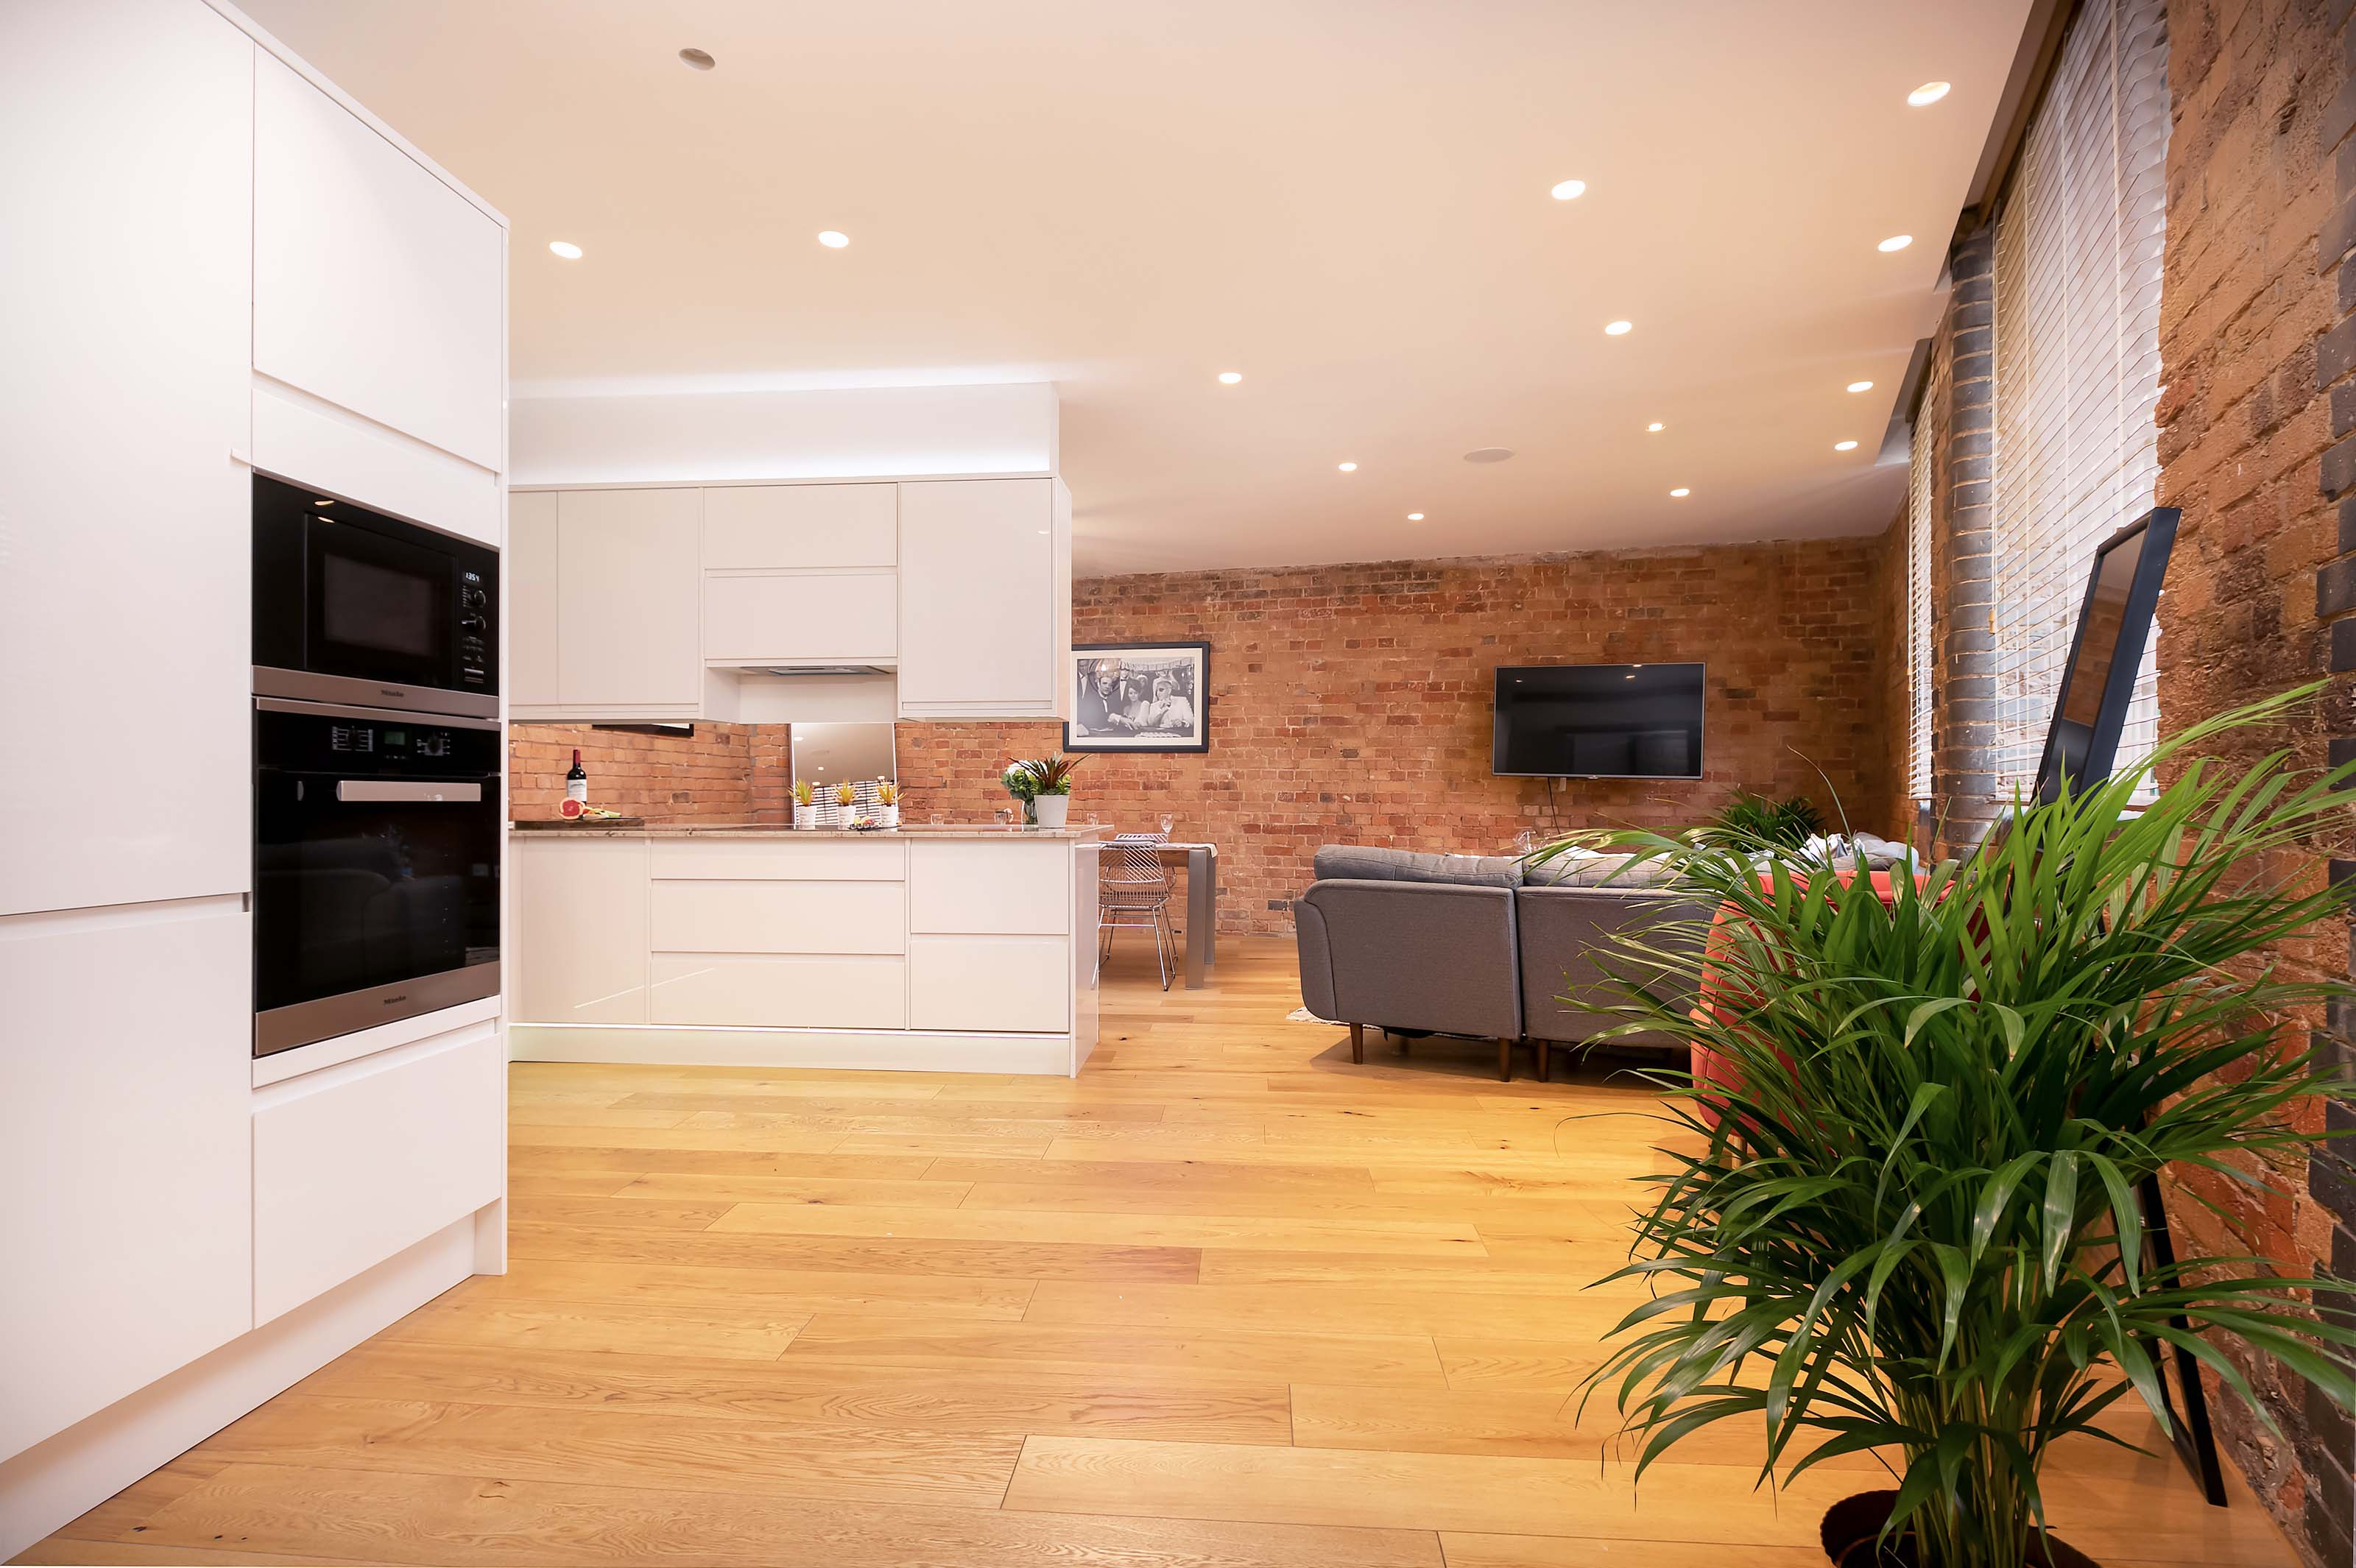 Lovelydays luxury service apartment rental - London - Fitzrovia - Wells Mews B - Lovelysuite - 2 bedrooms - 2 bathrooms - Luxury living room - d7b6383b8c90 - Lovelydays